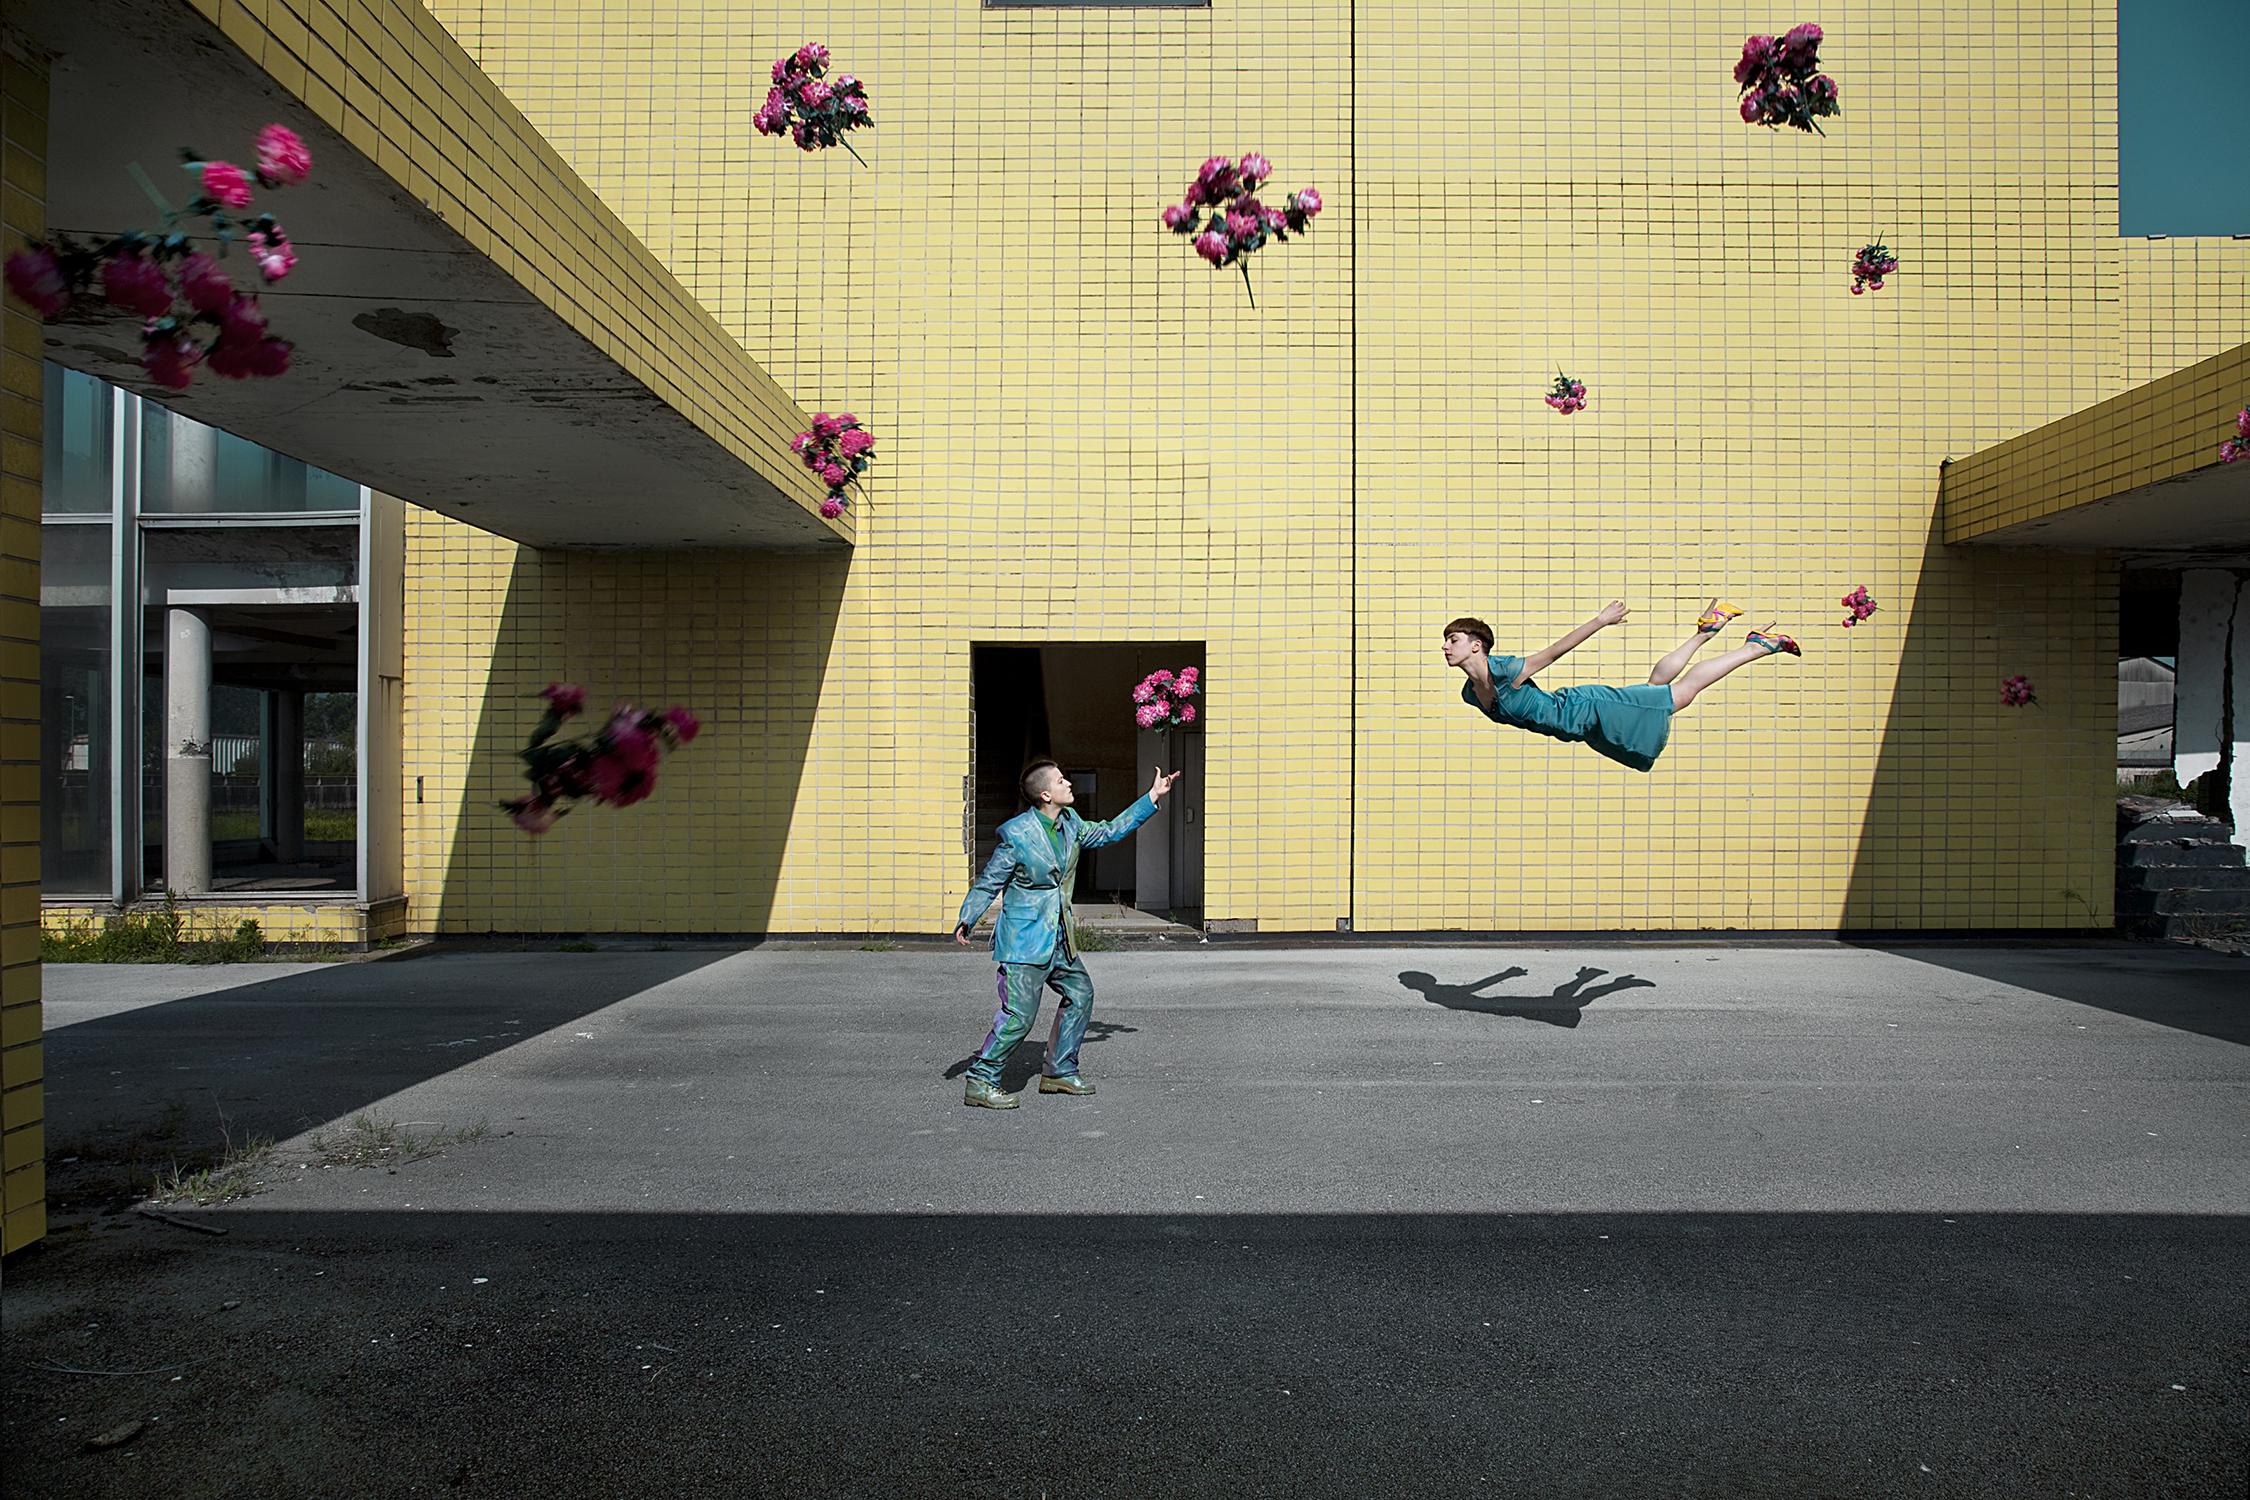 Promise of gravity-100cm x 150cm – Print on FineArt Baryta Hahnemühle / dibond-©2011 – Edition of 5-Finalist Celeste prize 2011